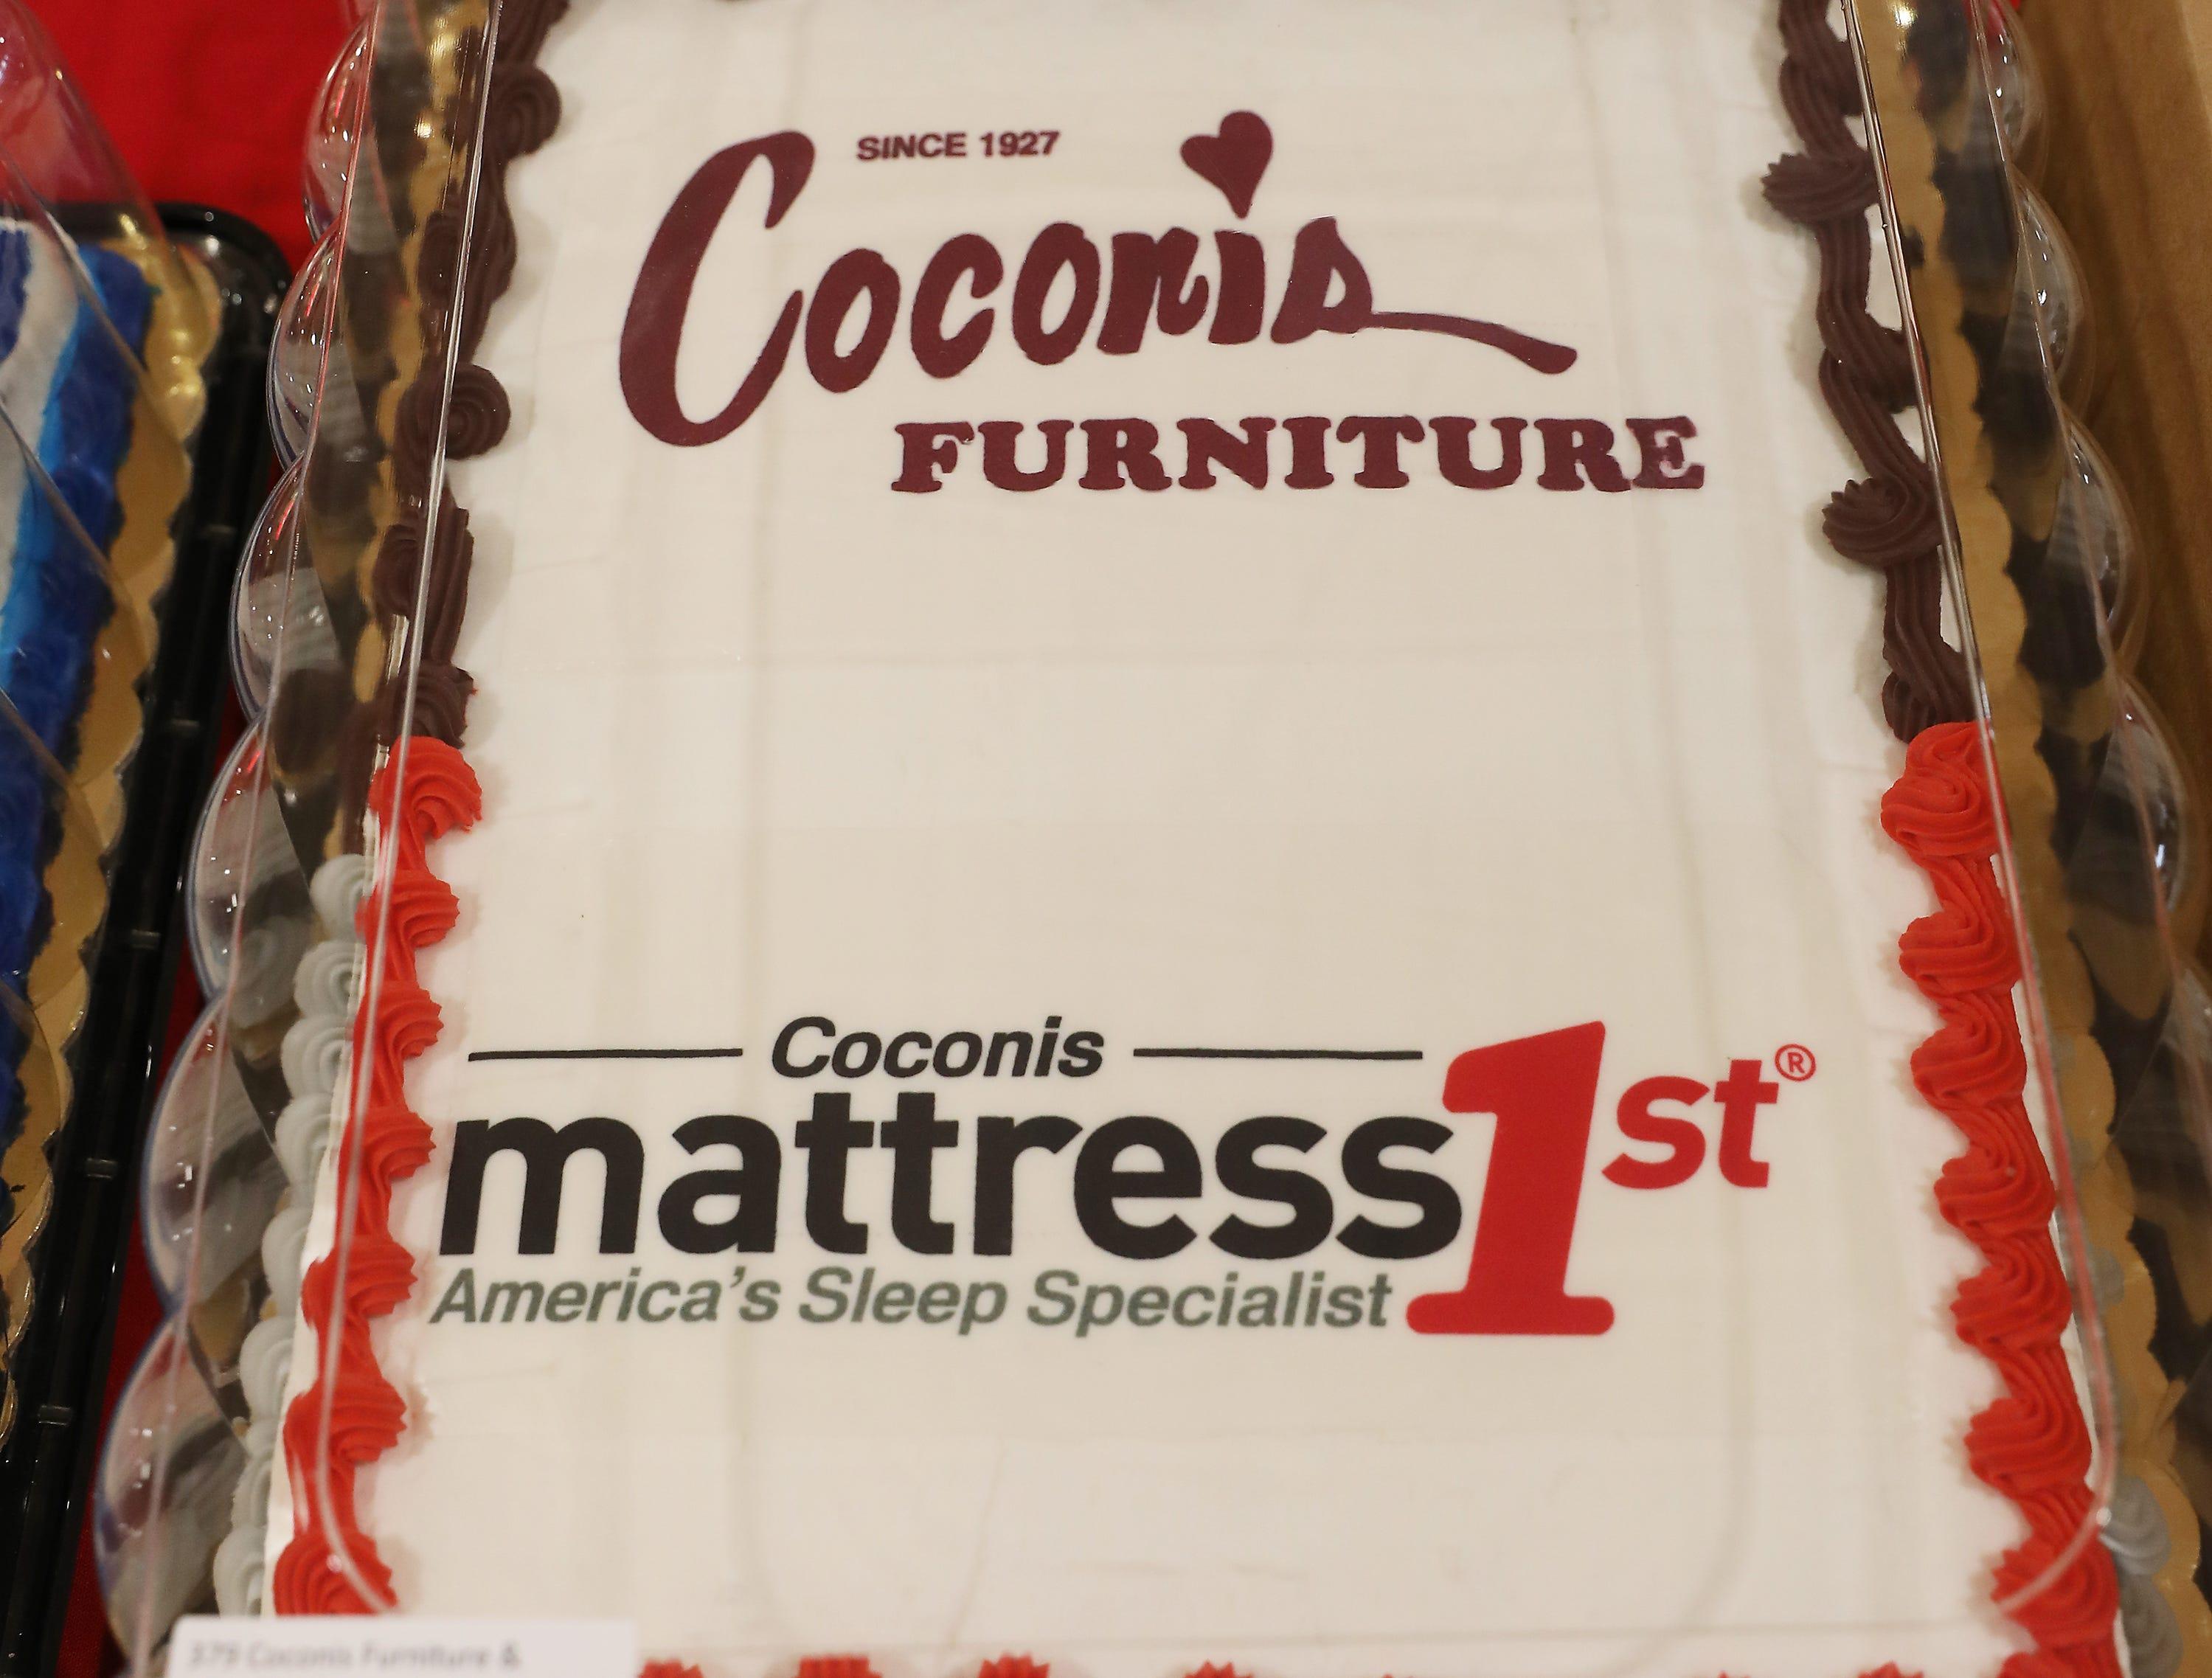 4:15 P.M. Friday cake 379 Coconis Furniture & Mattress 1st - $500 gift card, digital billboard display message; $1,000